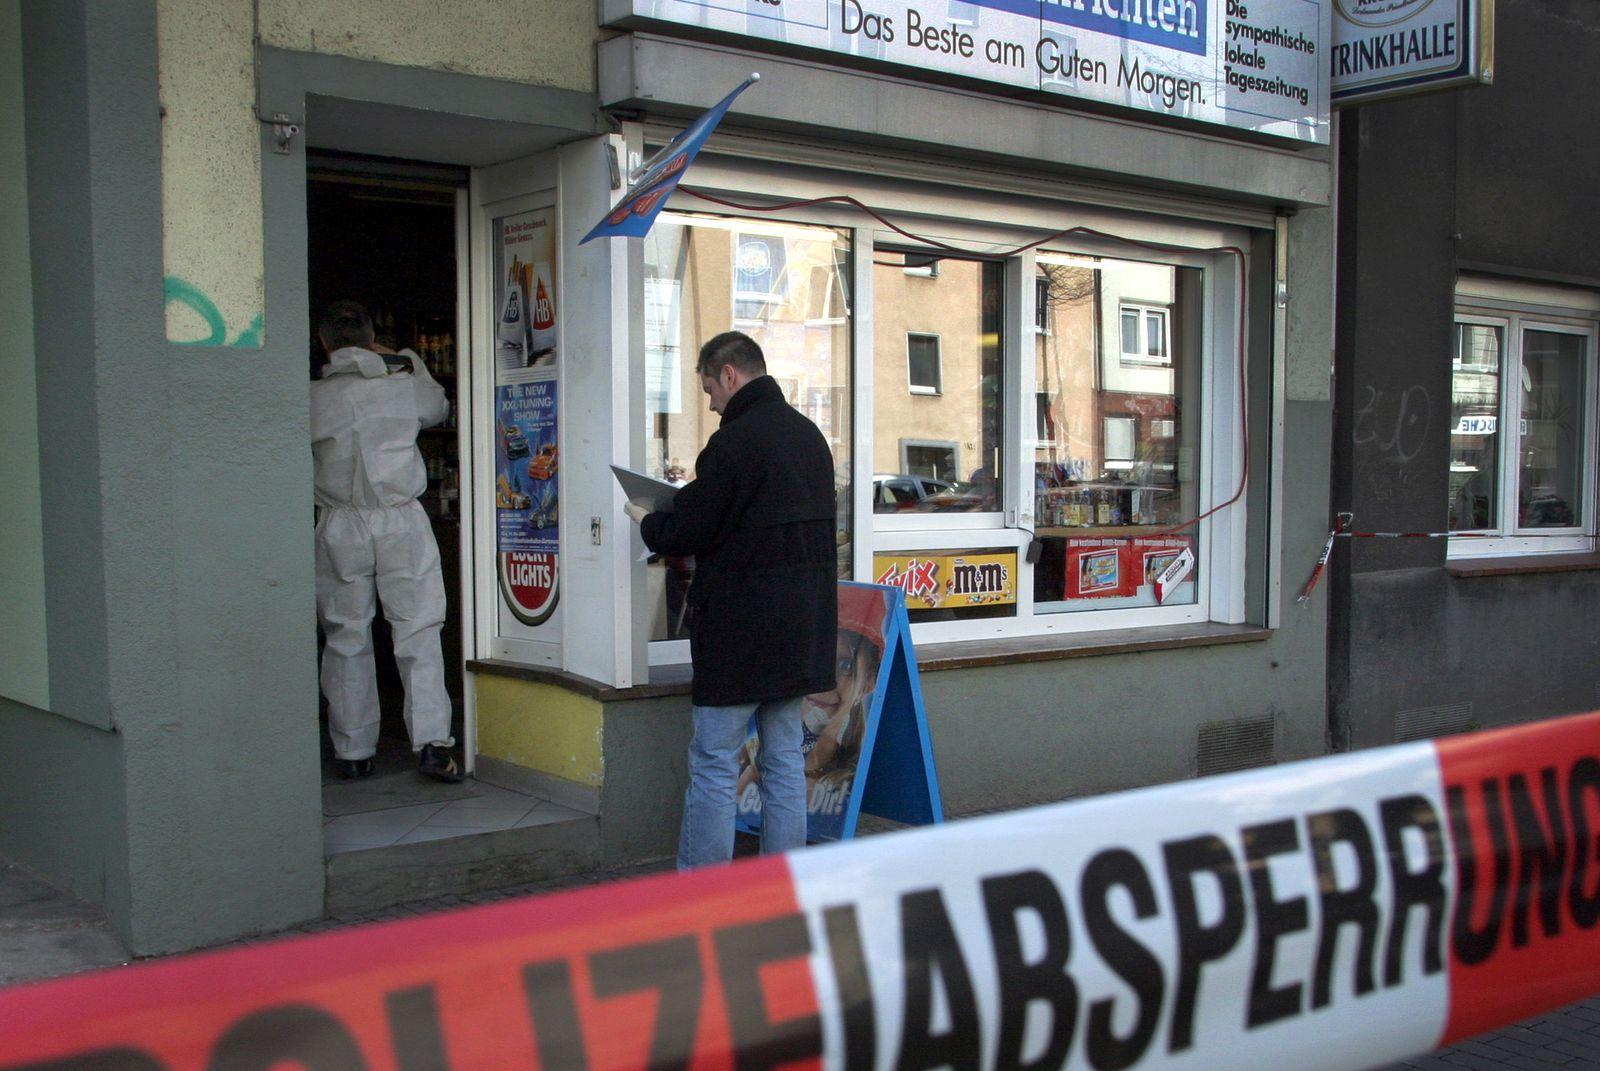 NSU Mordserie/ Dortmund/ Kioskbesitzer